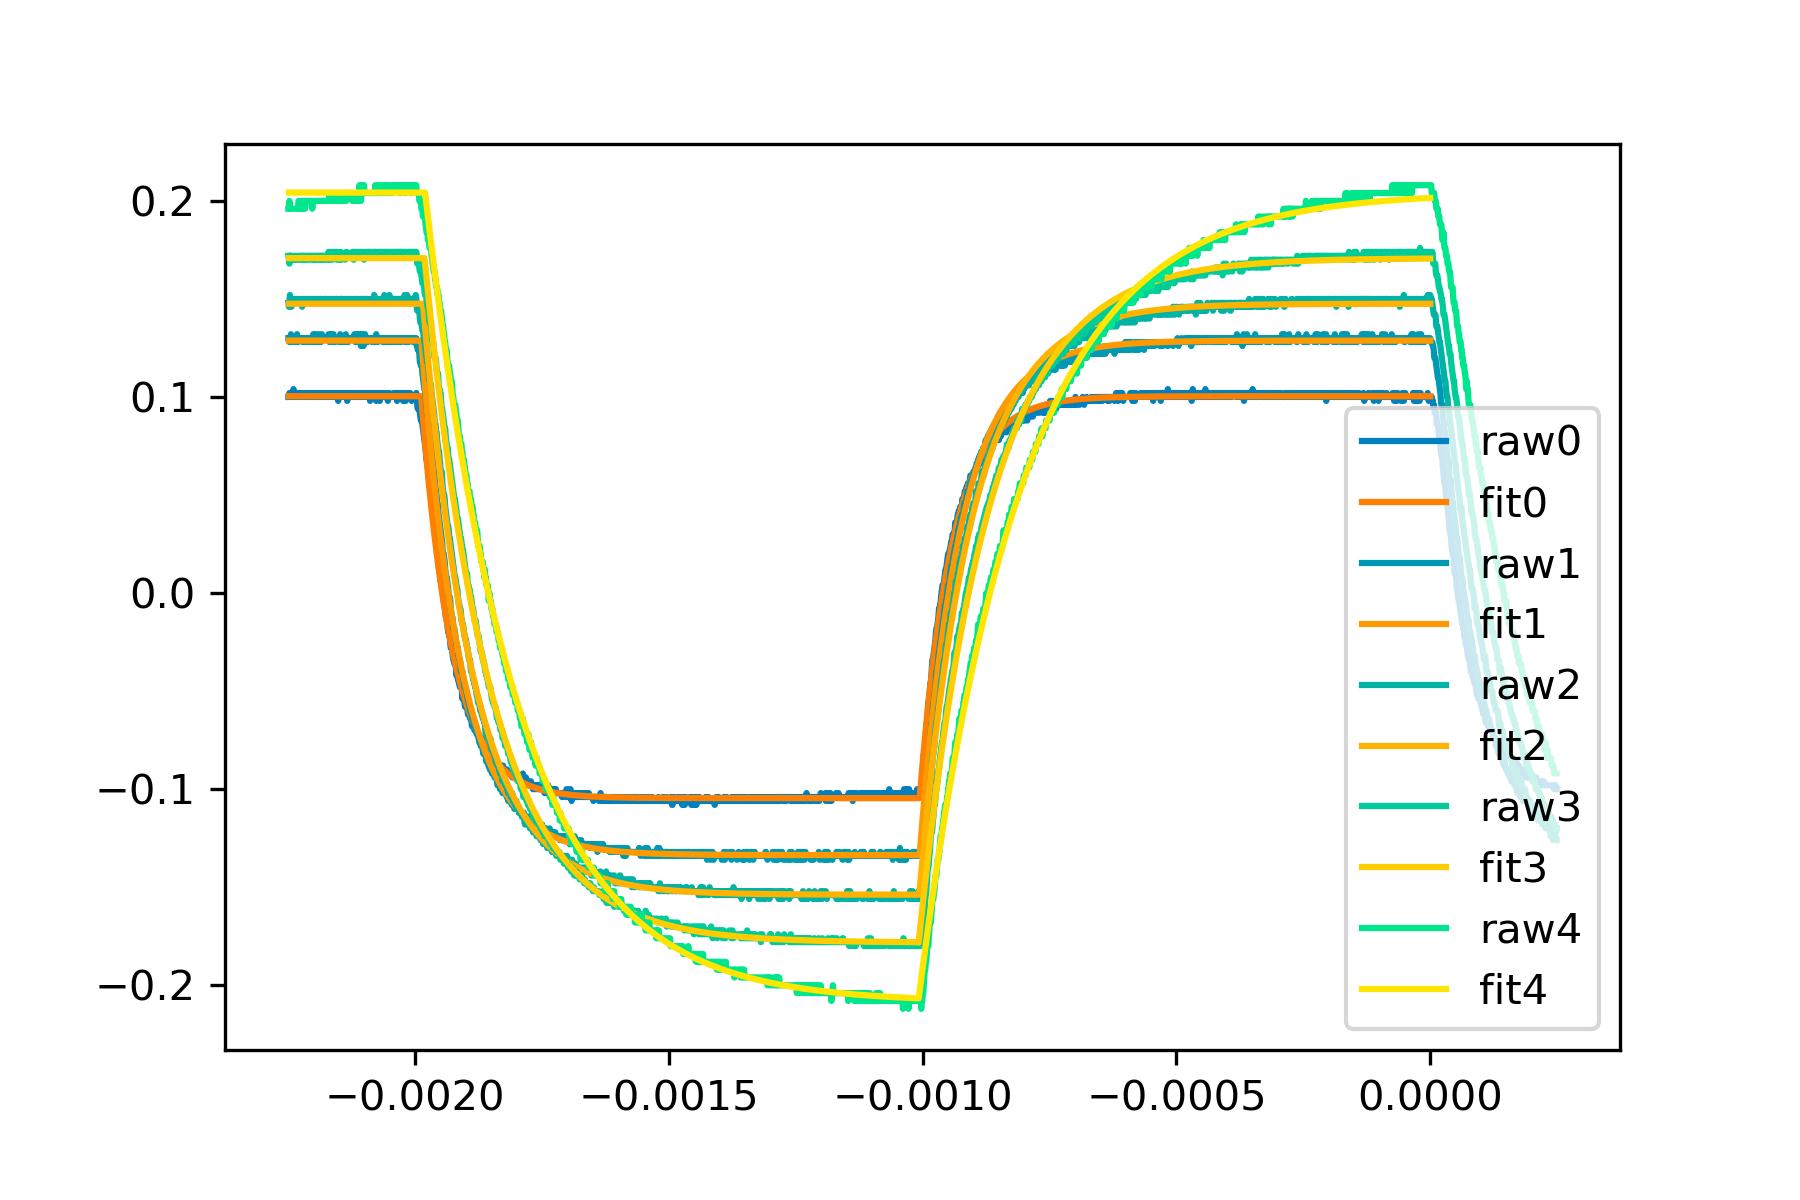 data20150202006_5a_1graph.png